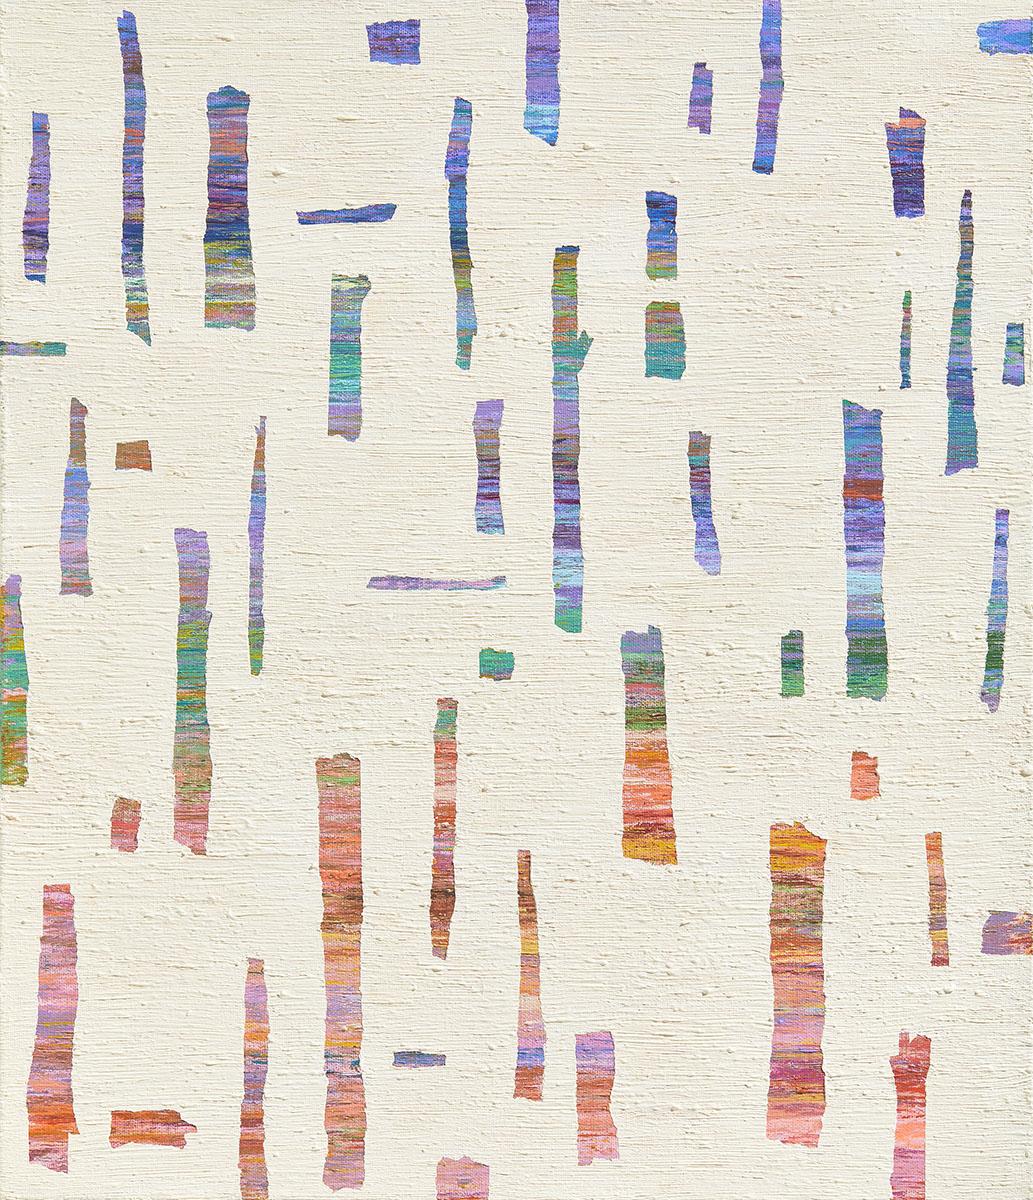 Dreaming Tree︱53.0x45.0cm, Acrylic on canvas︱2019